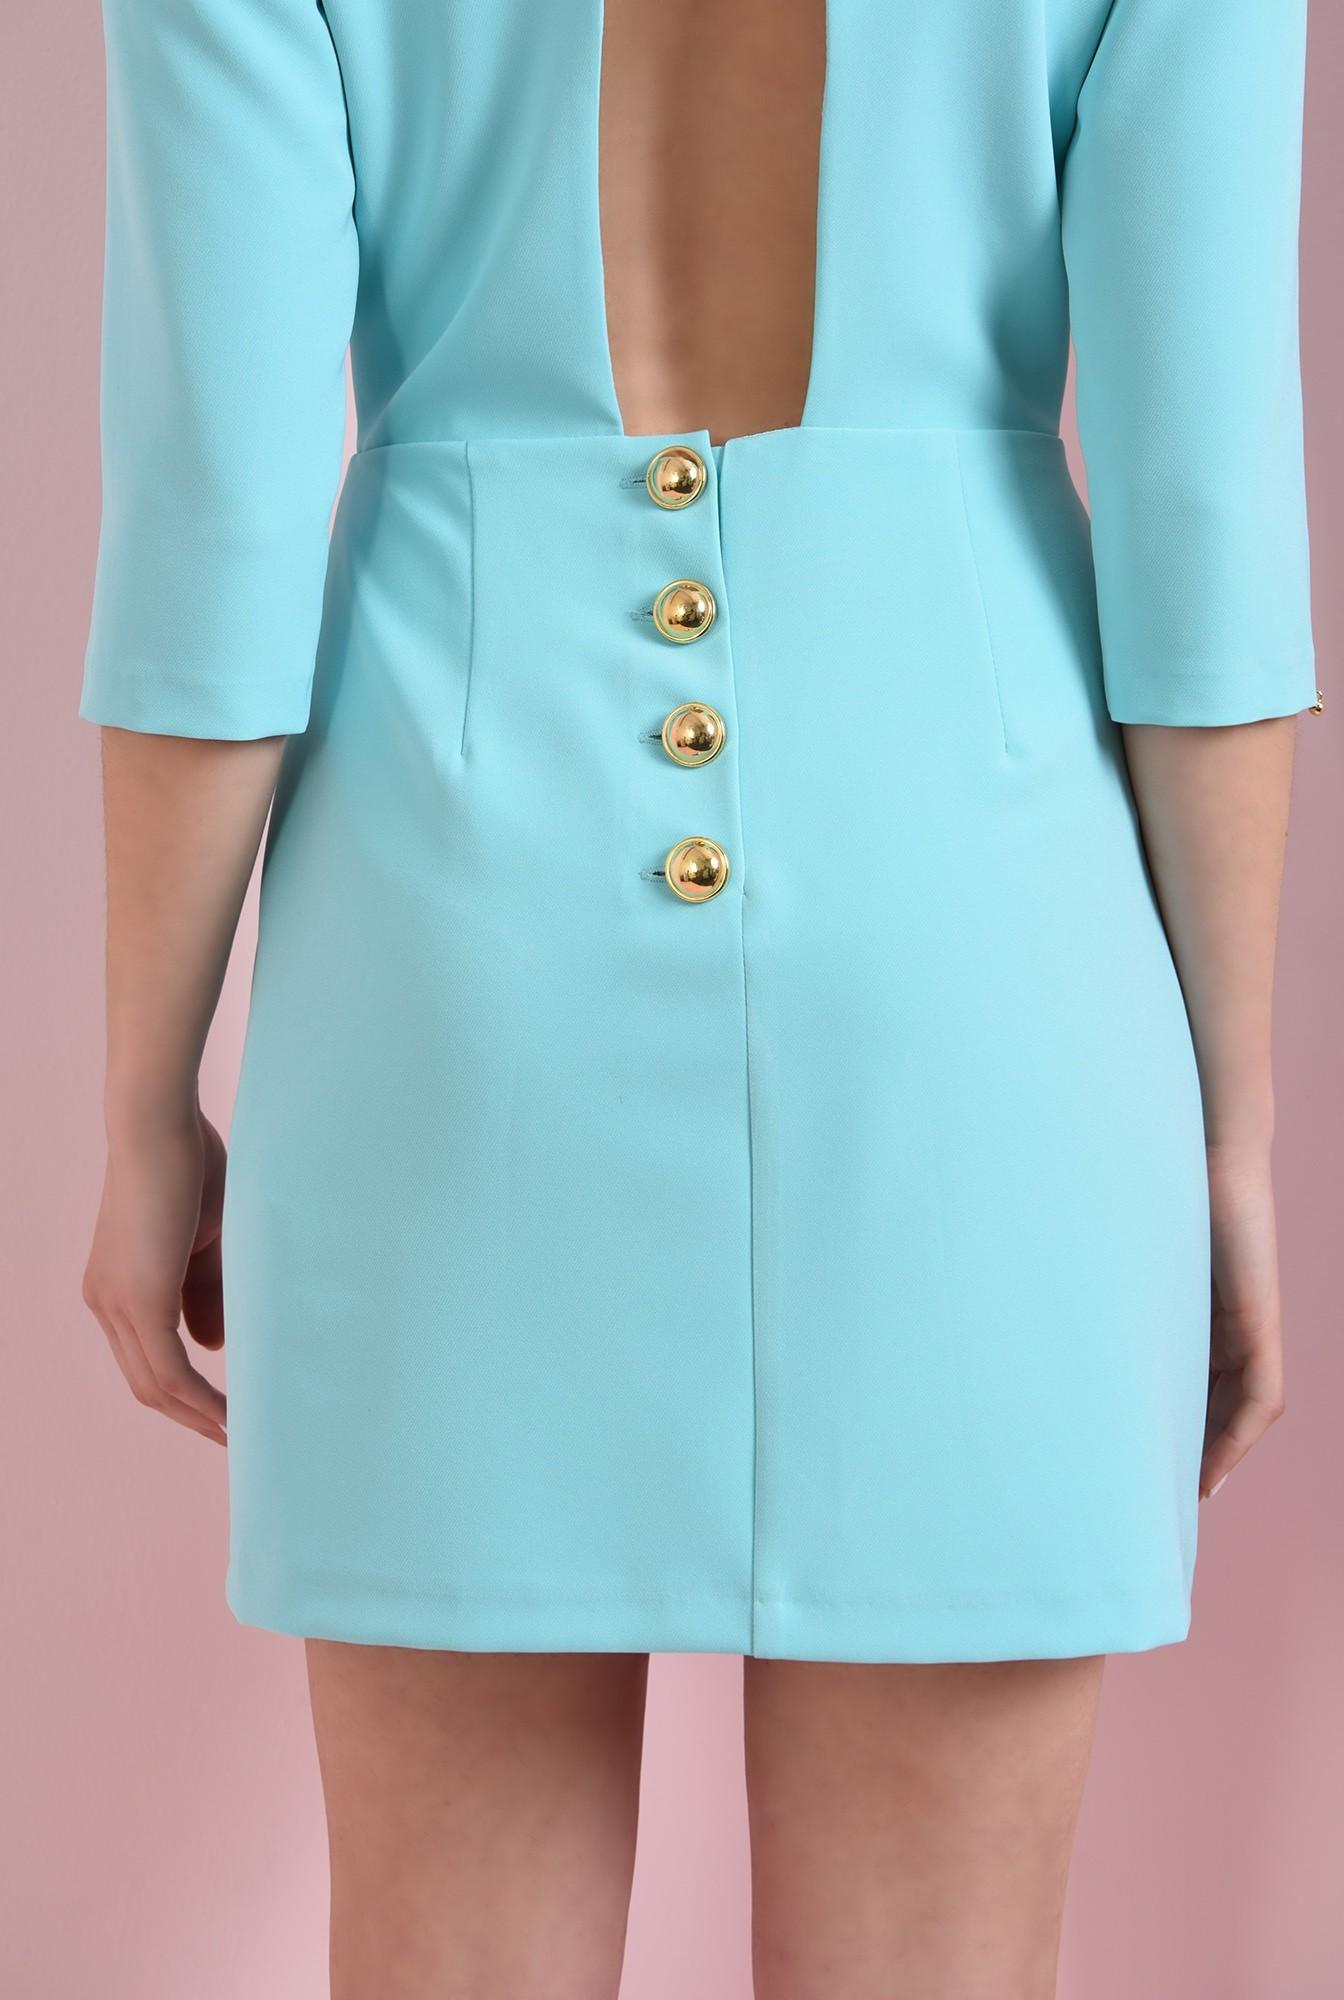 2 - 360 - rochie mini, turcoaz, cu decupaj